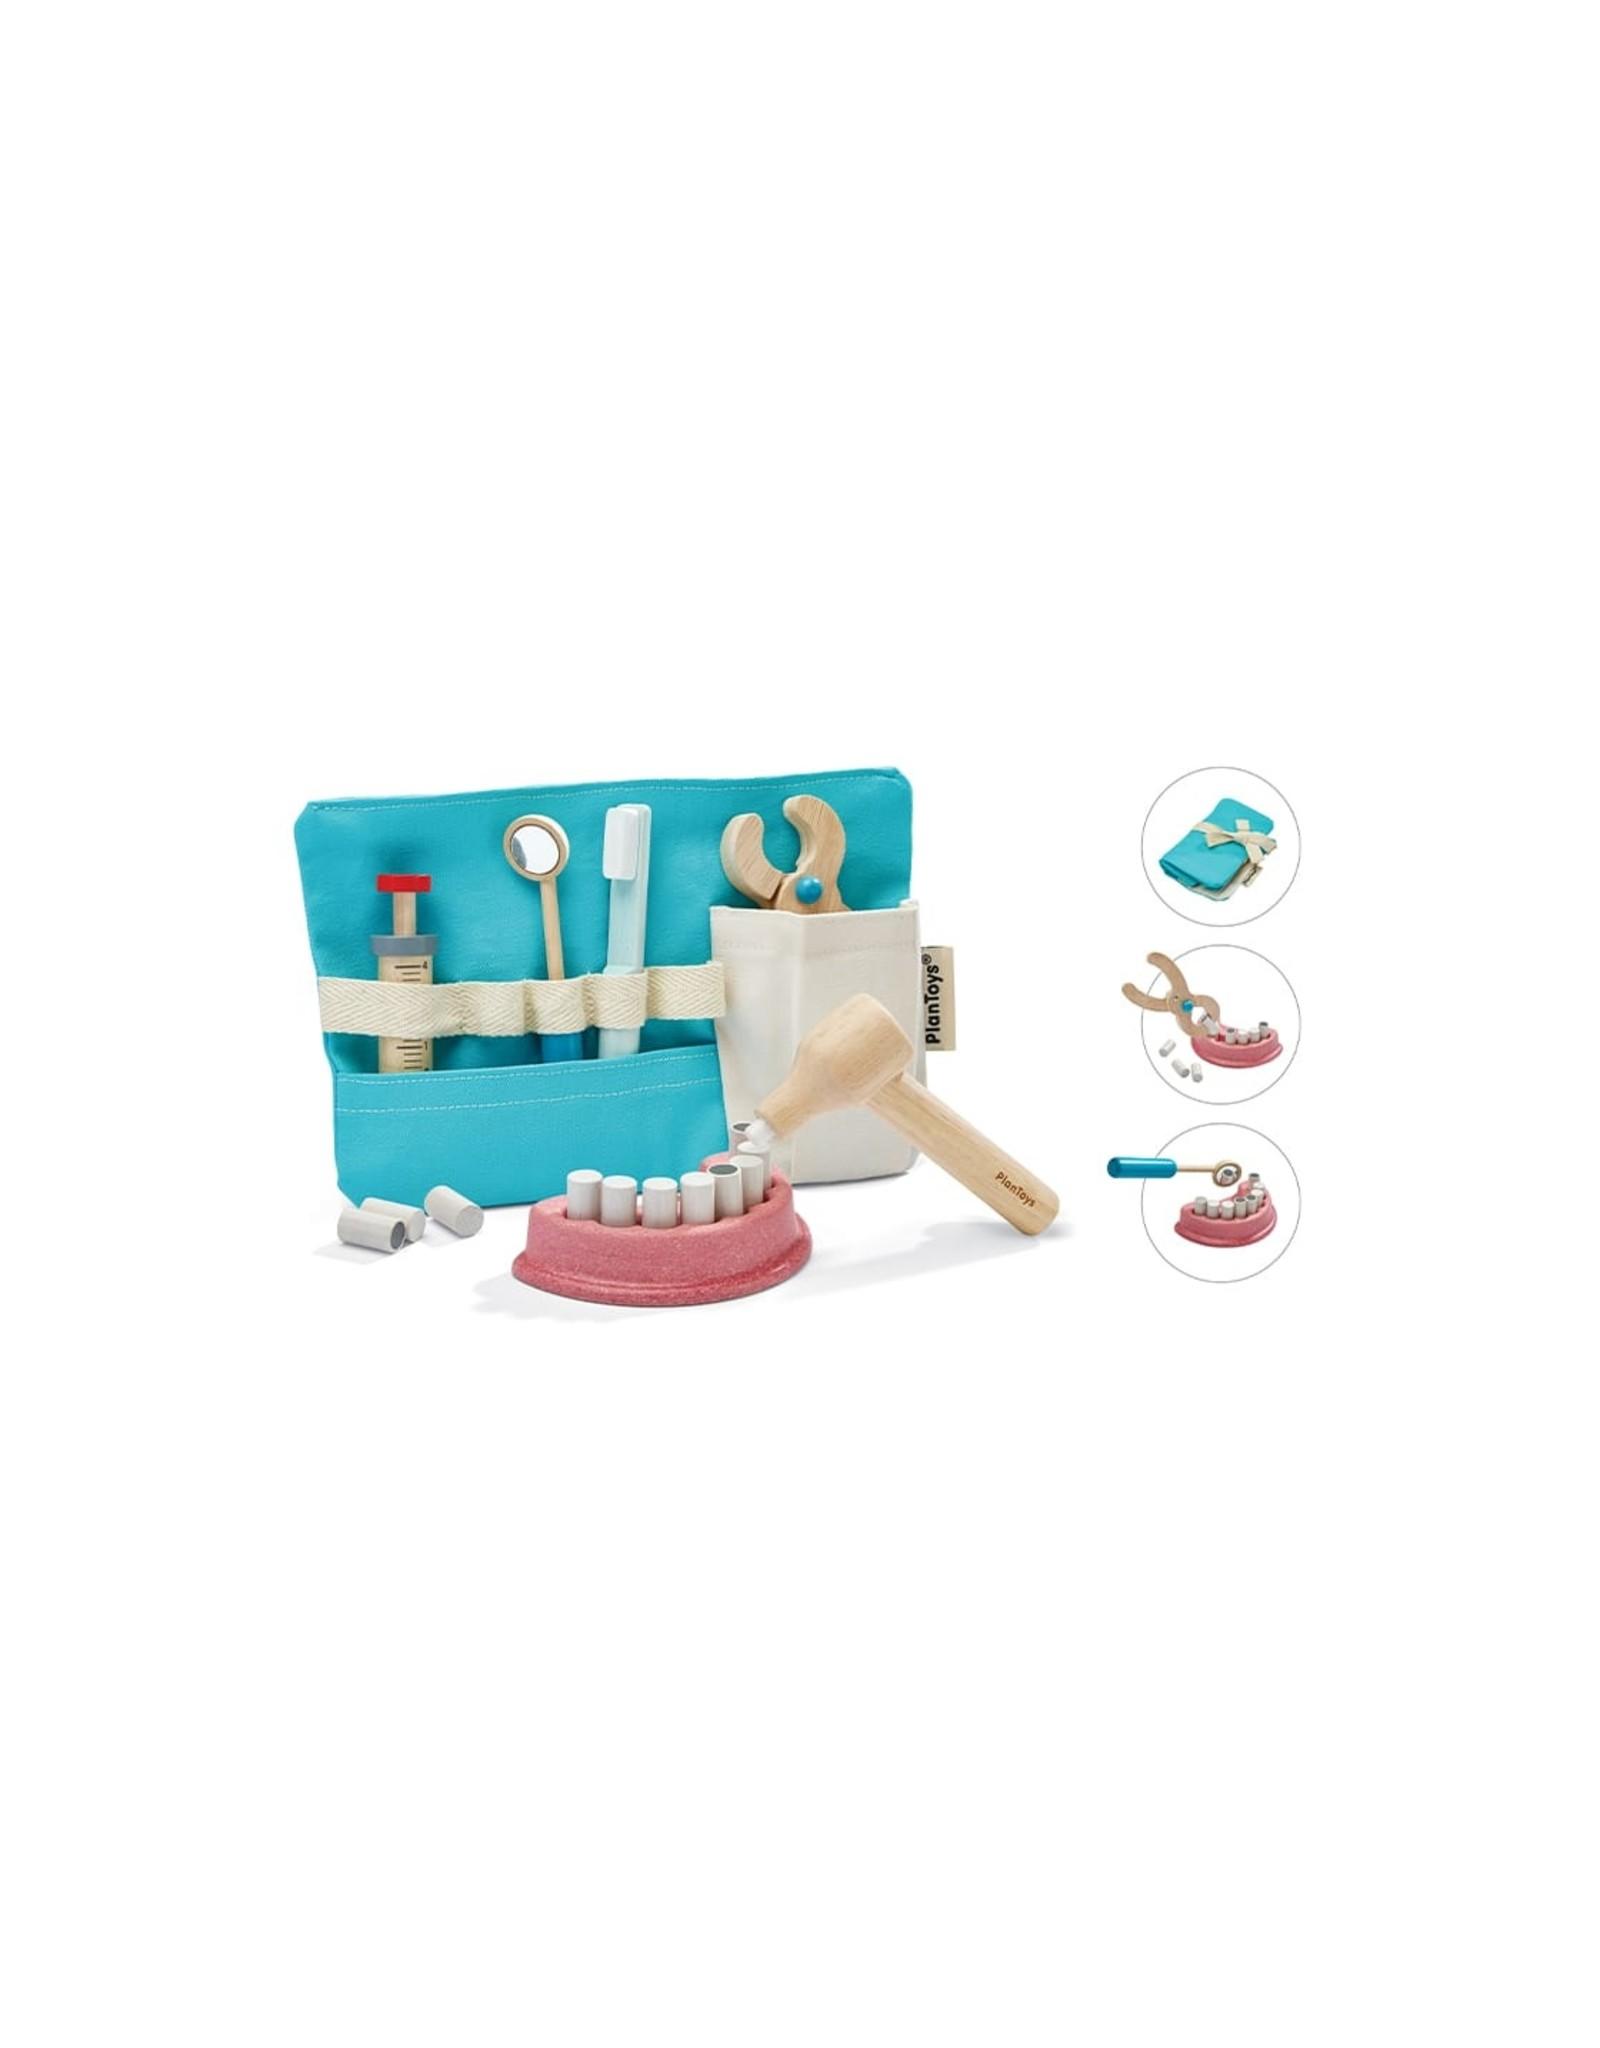 Plan Toys Dentist Set By Plan Toys